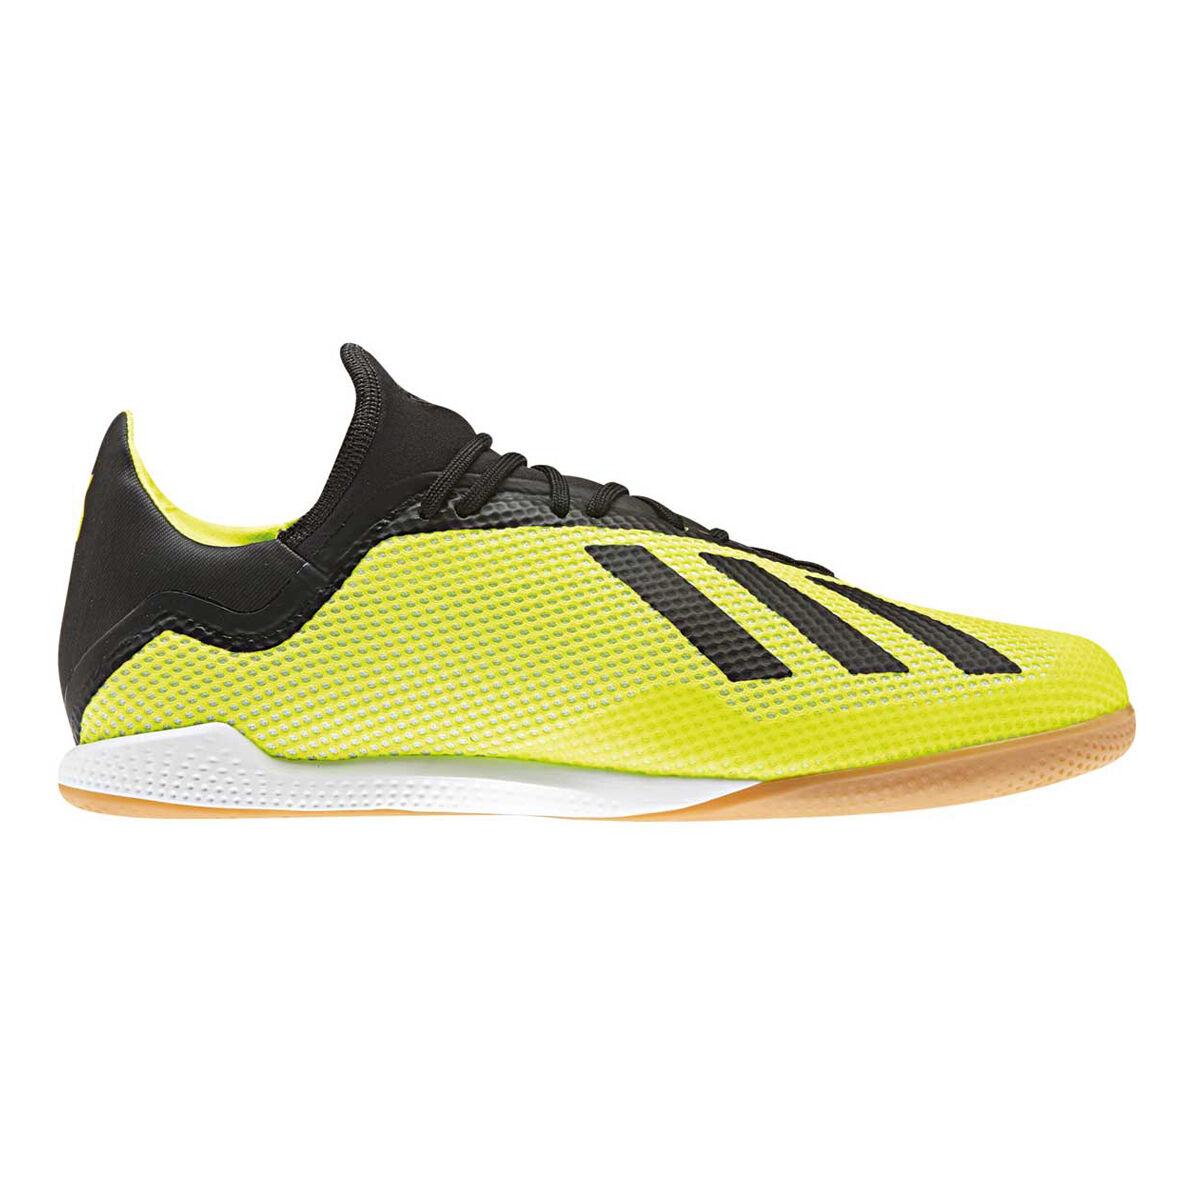 adidas X Tango 18.3 Mens Indoor Soccer Shoes